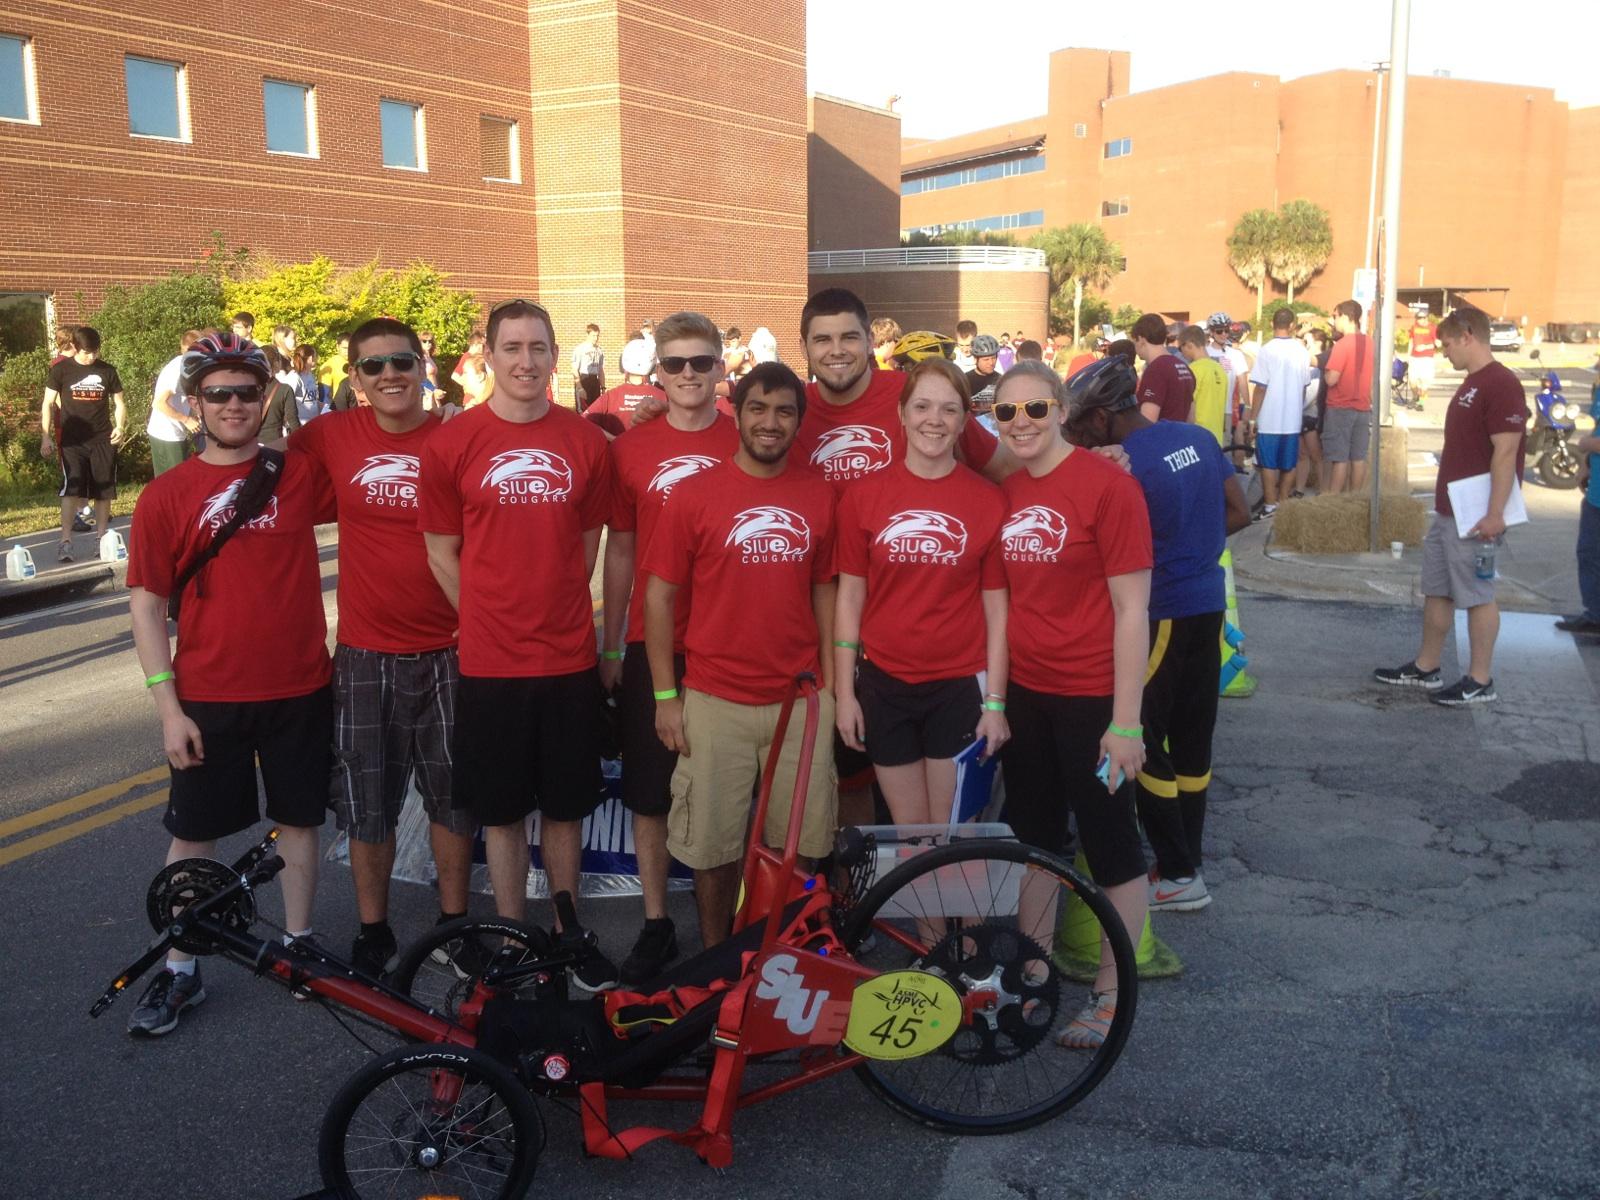 1c43768b0fc SIUE_ASME_HPVC_Competition_2014_April_Orlando_Florida_team_photo